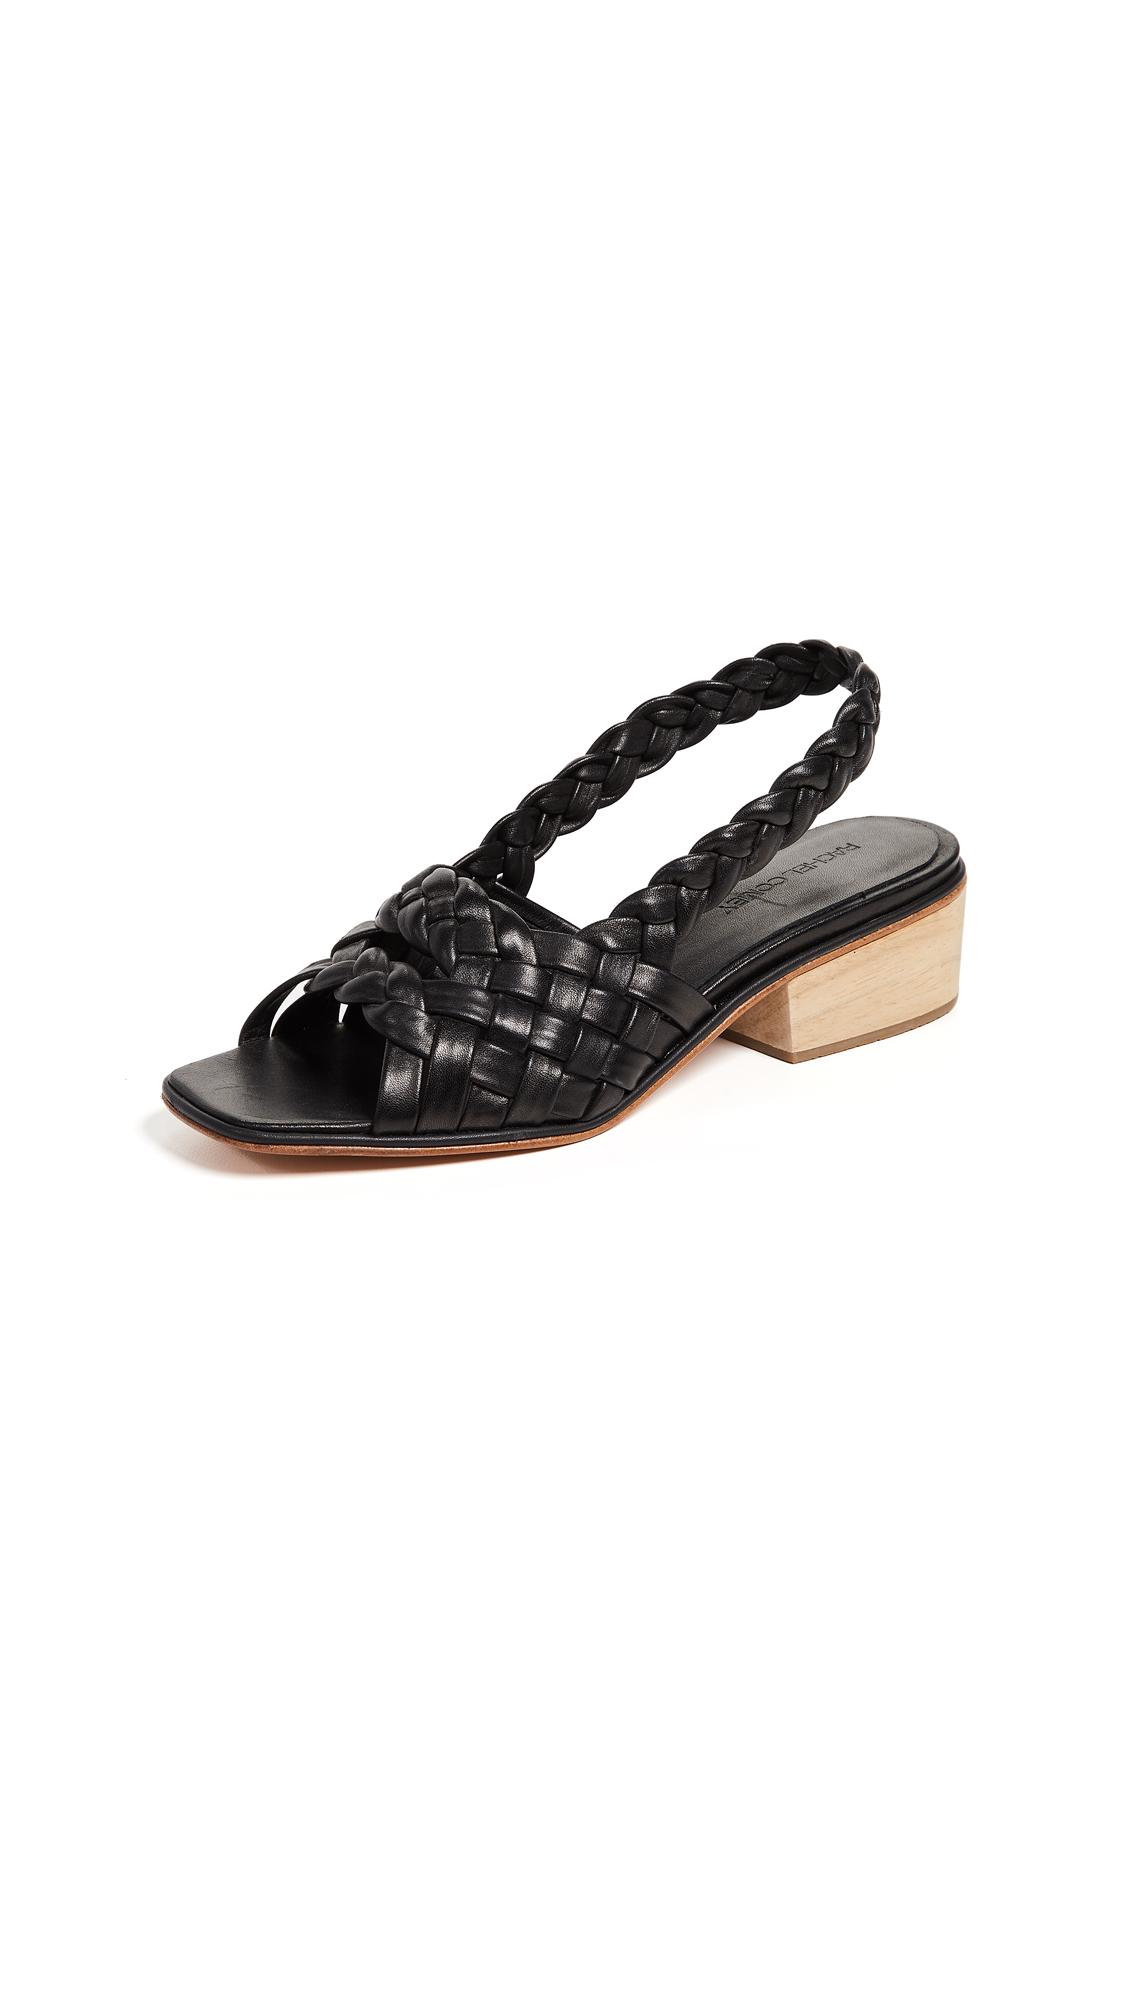 Rachel Comey Blanca Slingback Sandals - Black